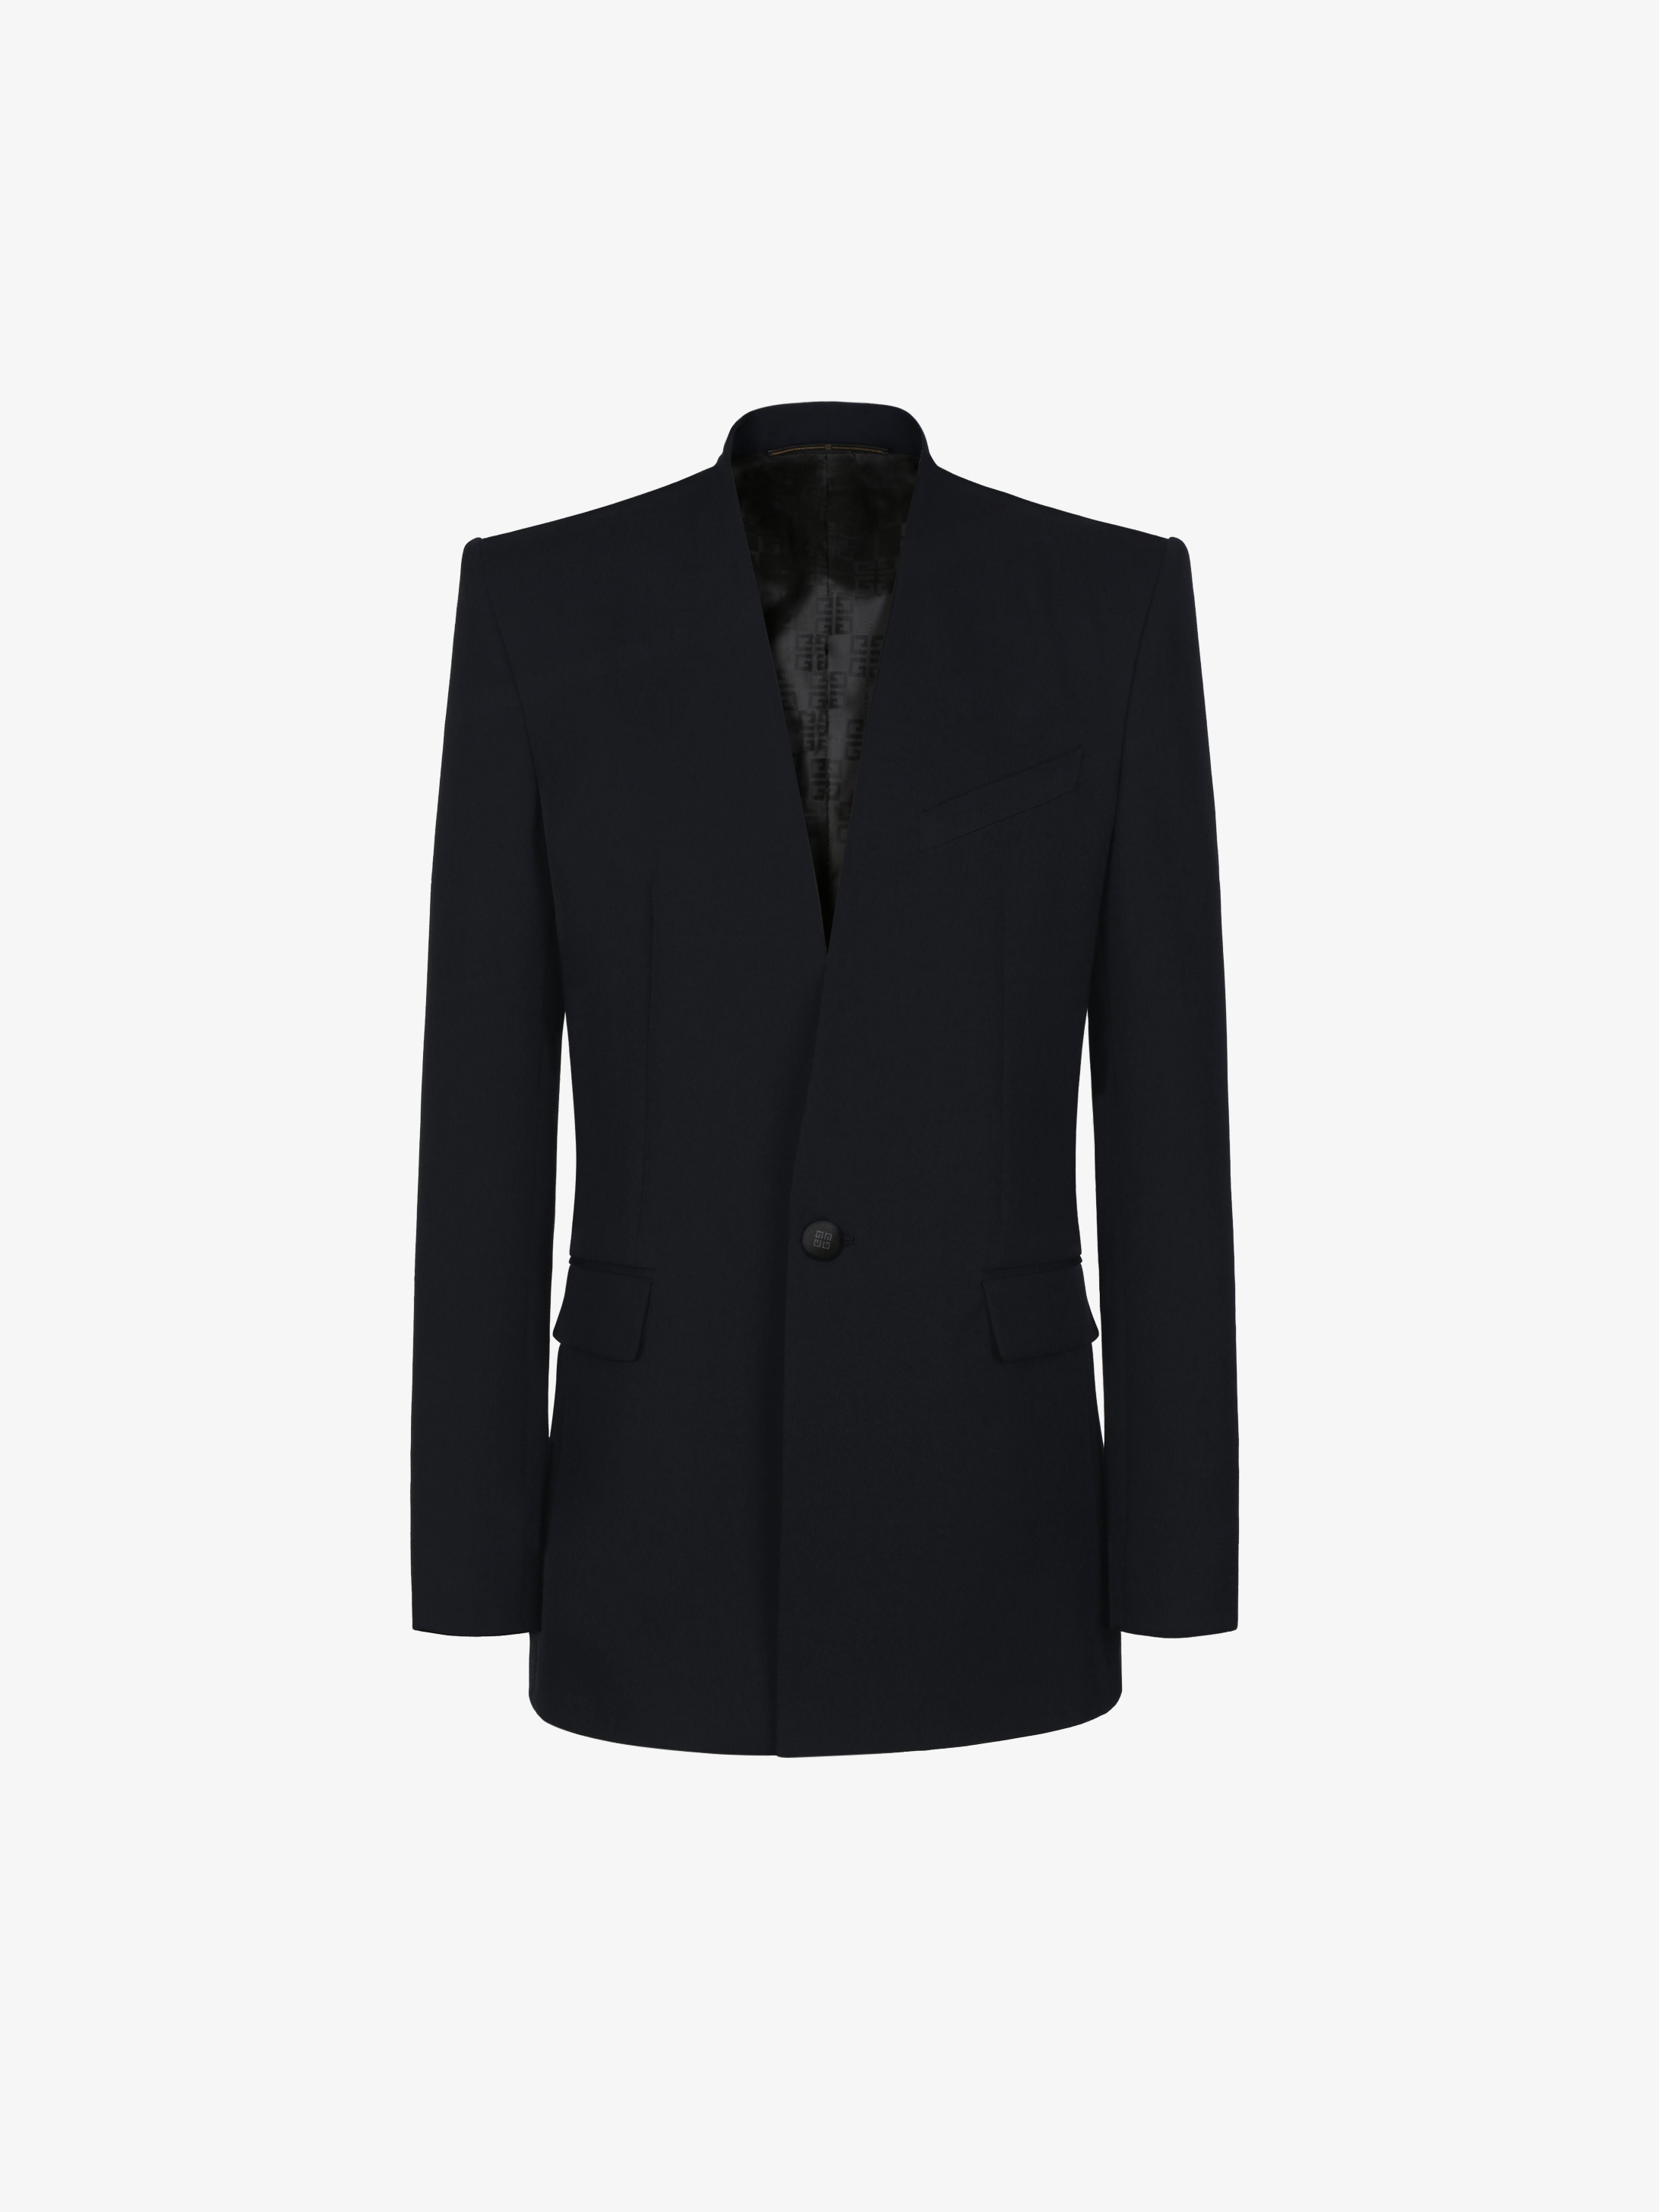 Collarless tuxedo jacket in wool